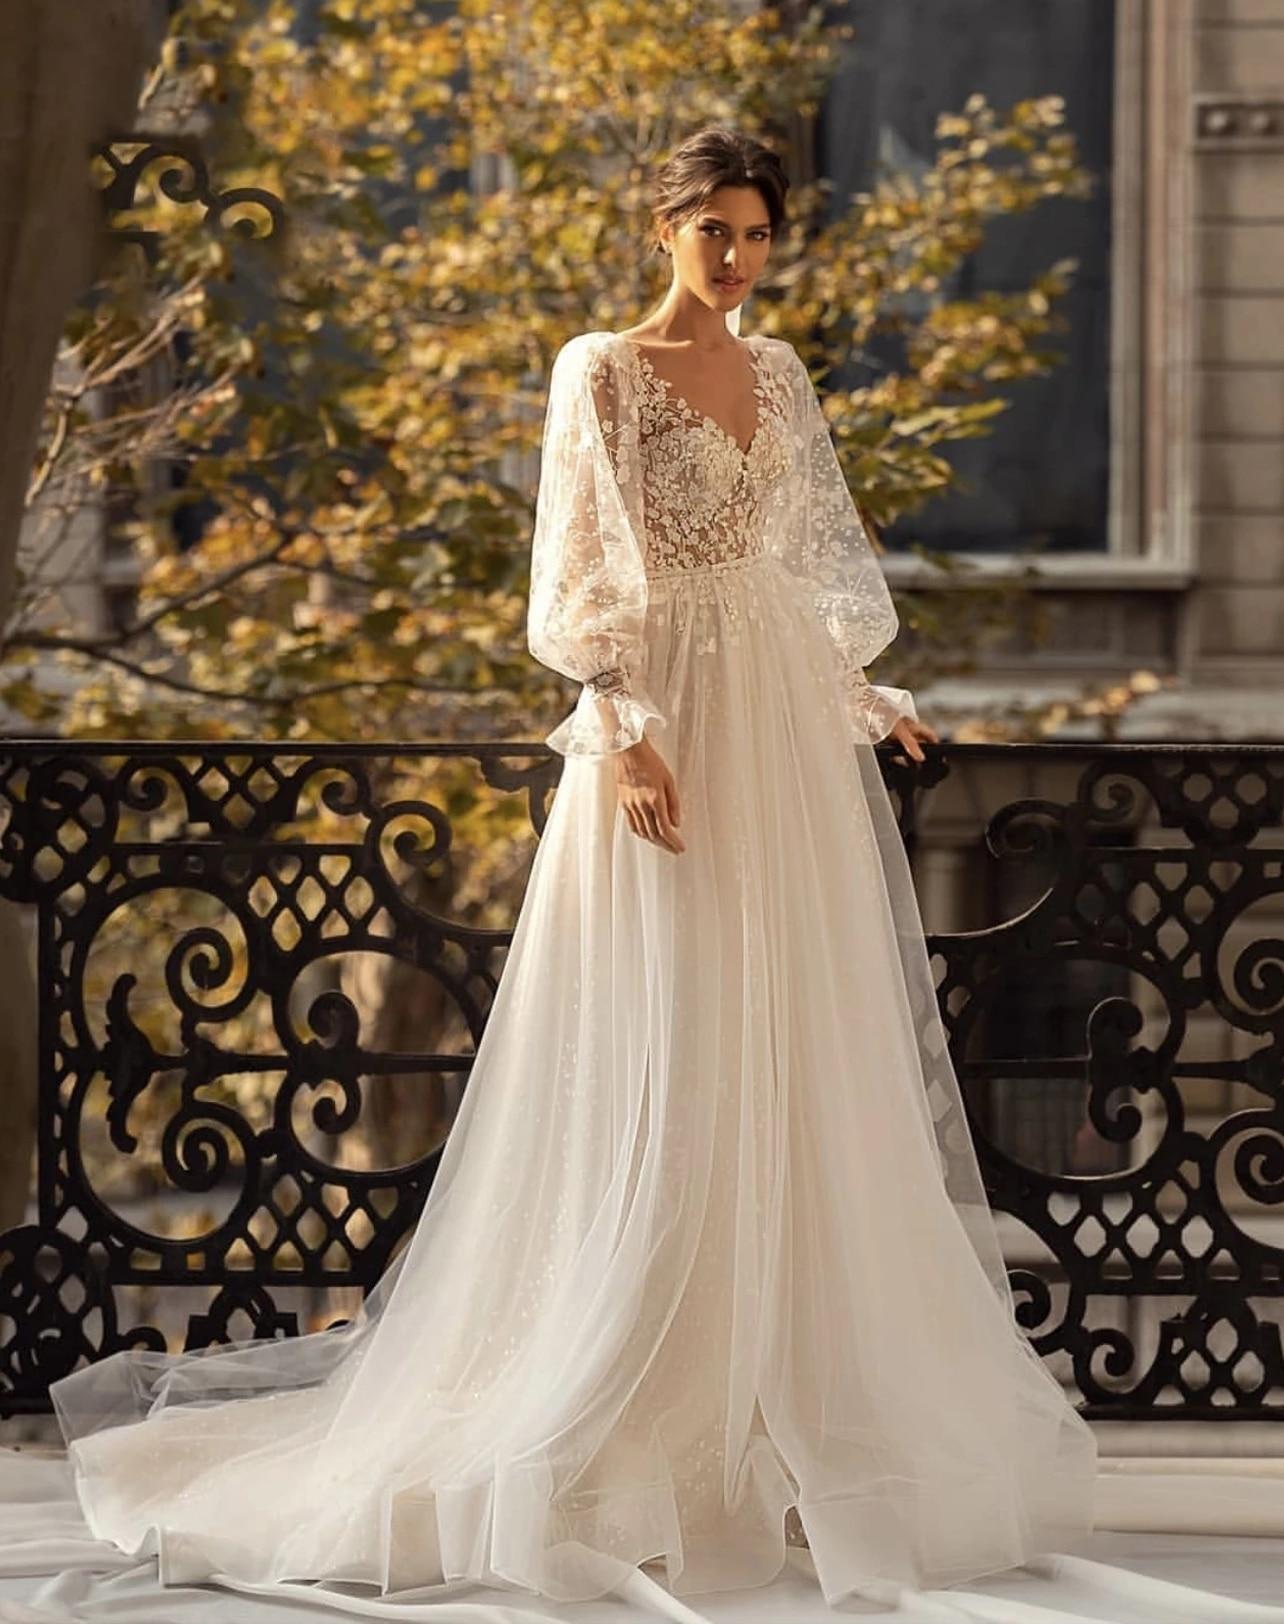 Promo Wedding dress Lace Wedding Dress Vintage V-Neck Sleeveless Tulle Bride Dress Pearl Elegant 3d Flowers Custom Made  Floor Length